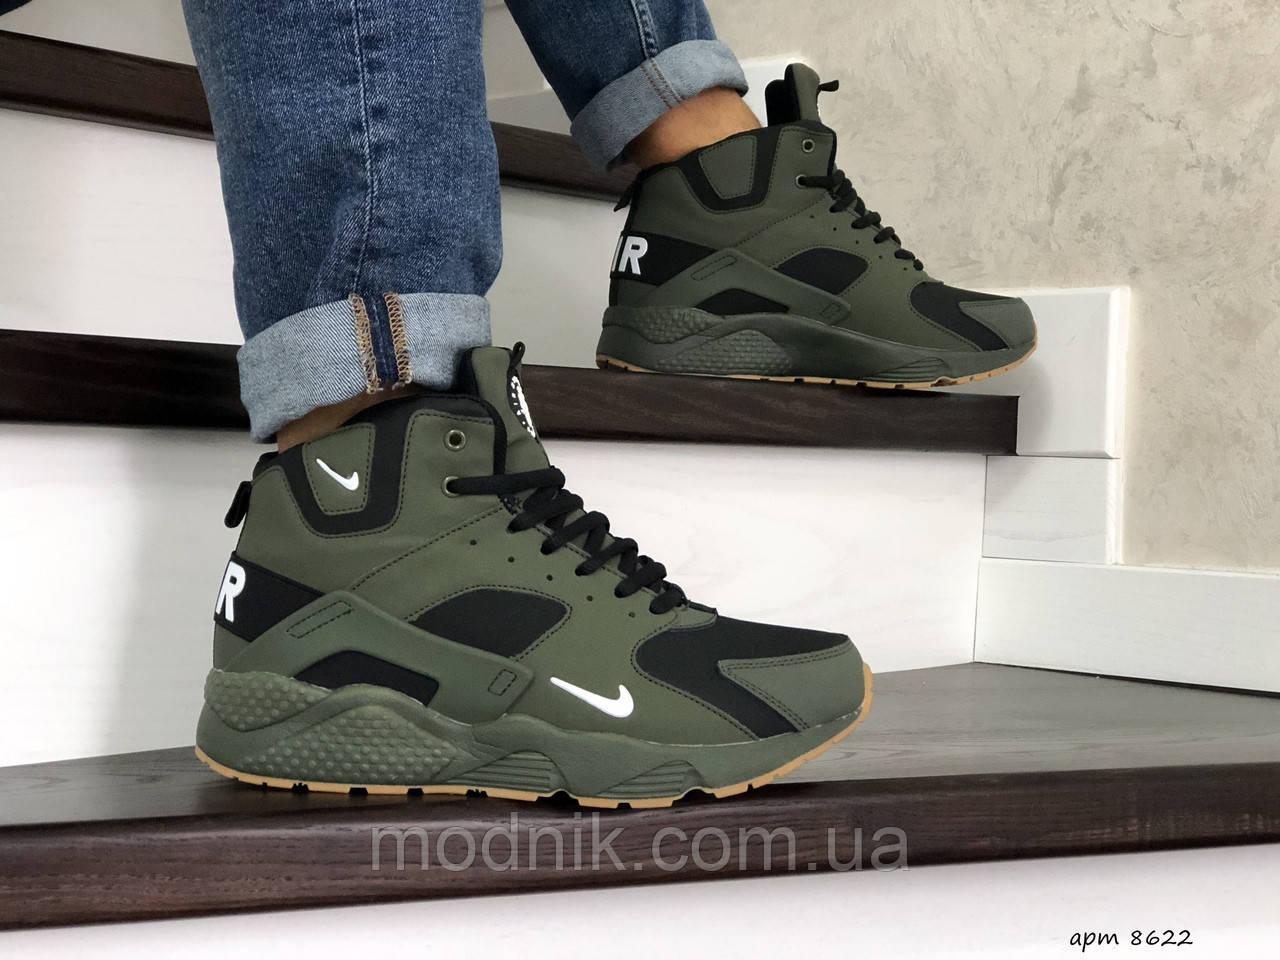 Мужские зимние кроссовки Nike Air Huarache (темно-зеленые)